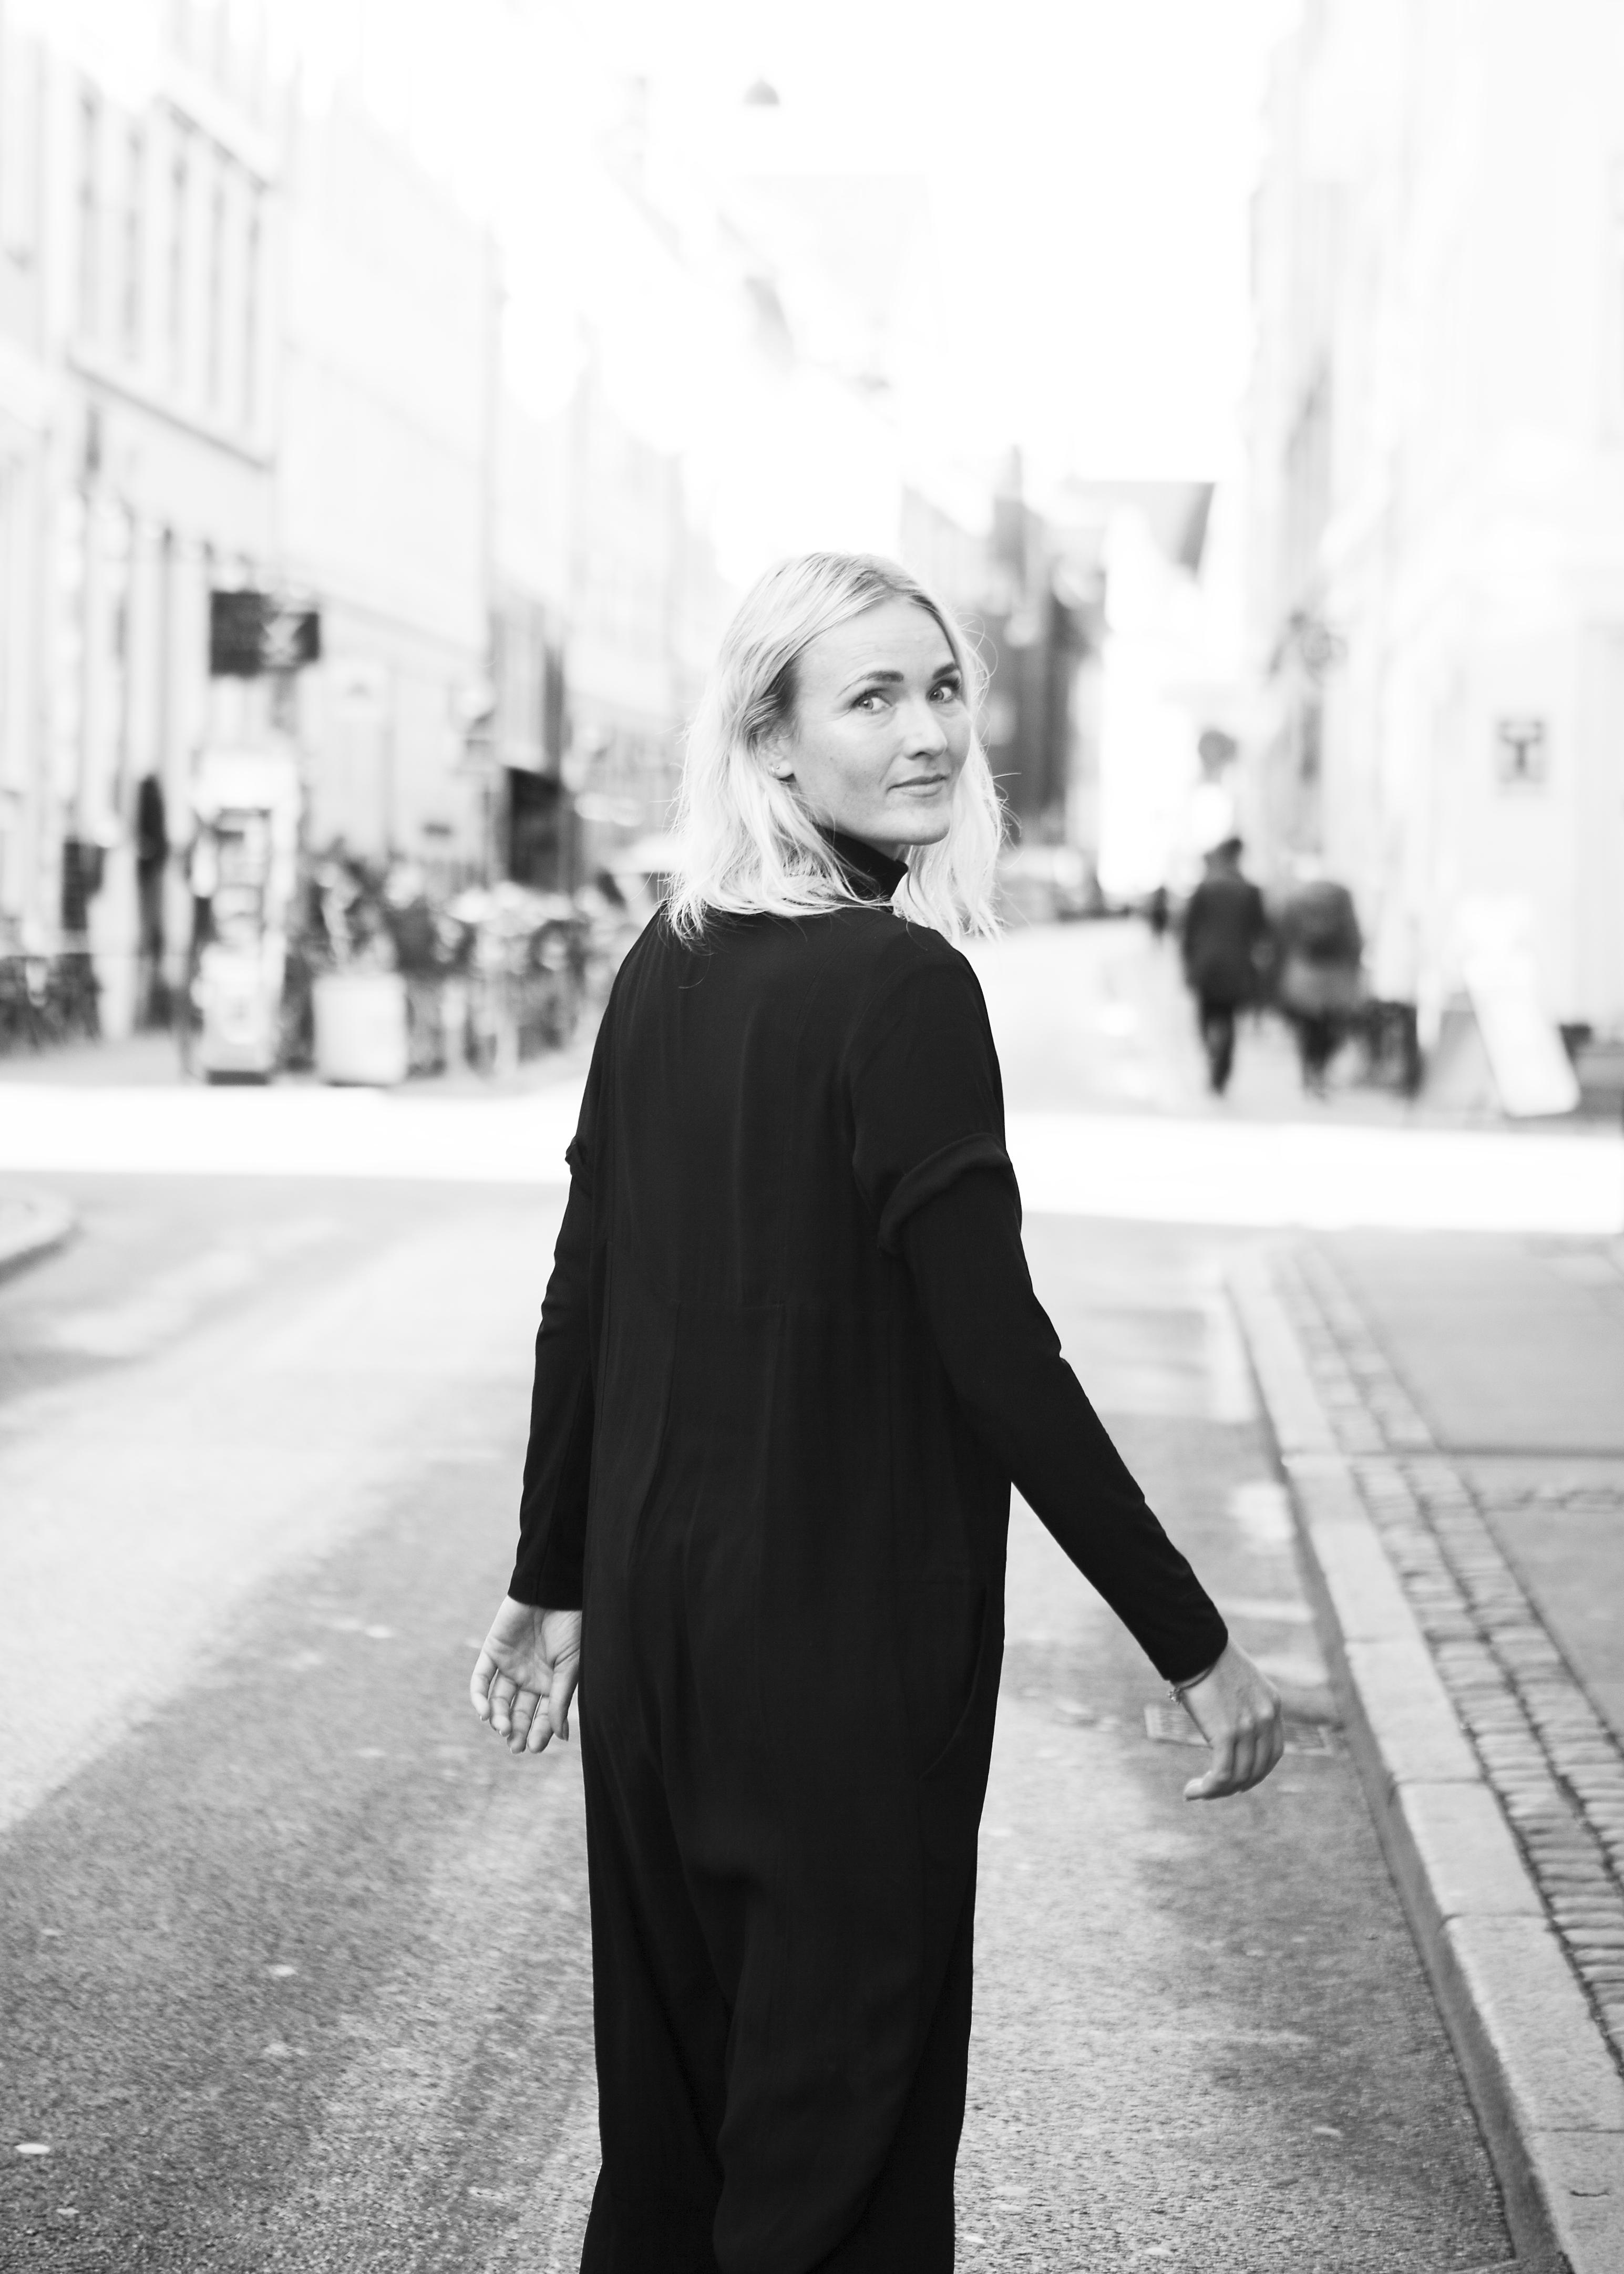 Marie Louise Tüxen debuterer med 'Jeg ser mig selv som rytmisk'. Kreditering: Foto: Hedda Rysstad.